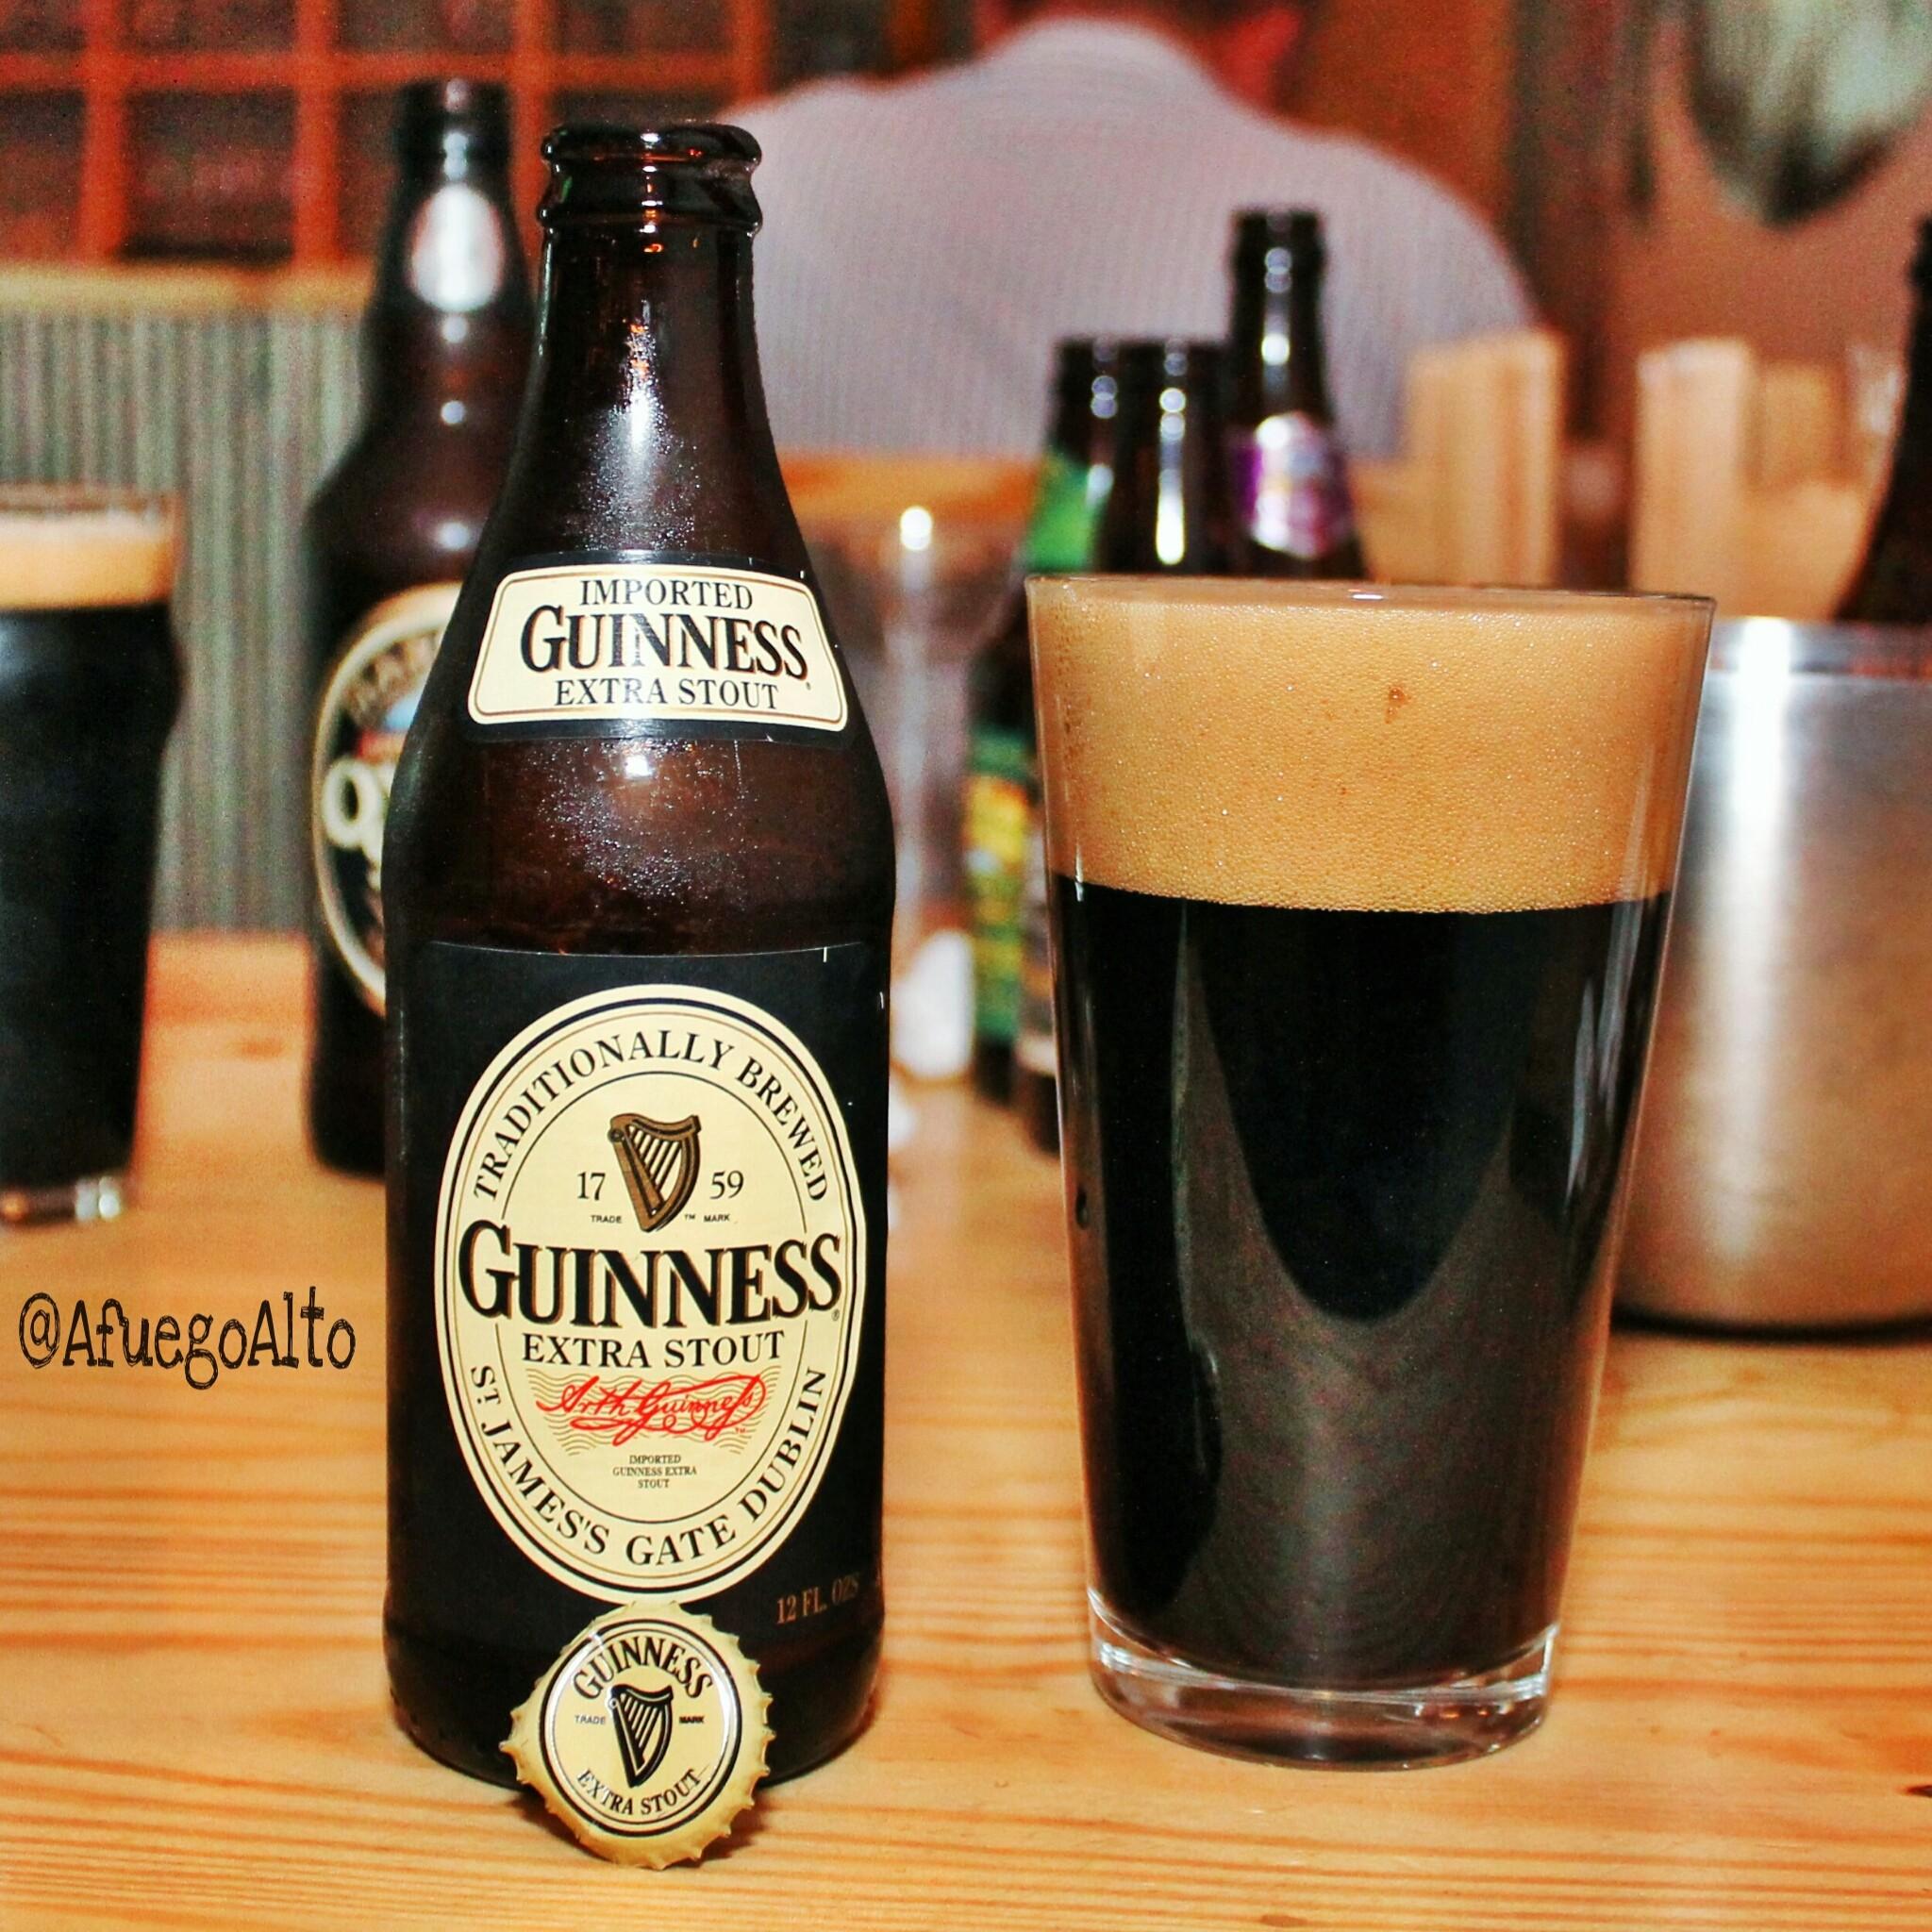 La fiebre de la cerveza se apodera de República Dominicana